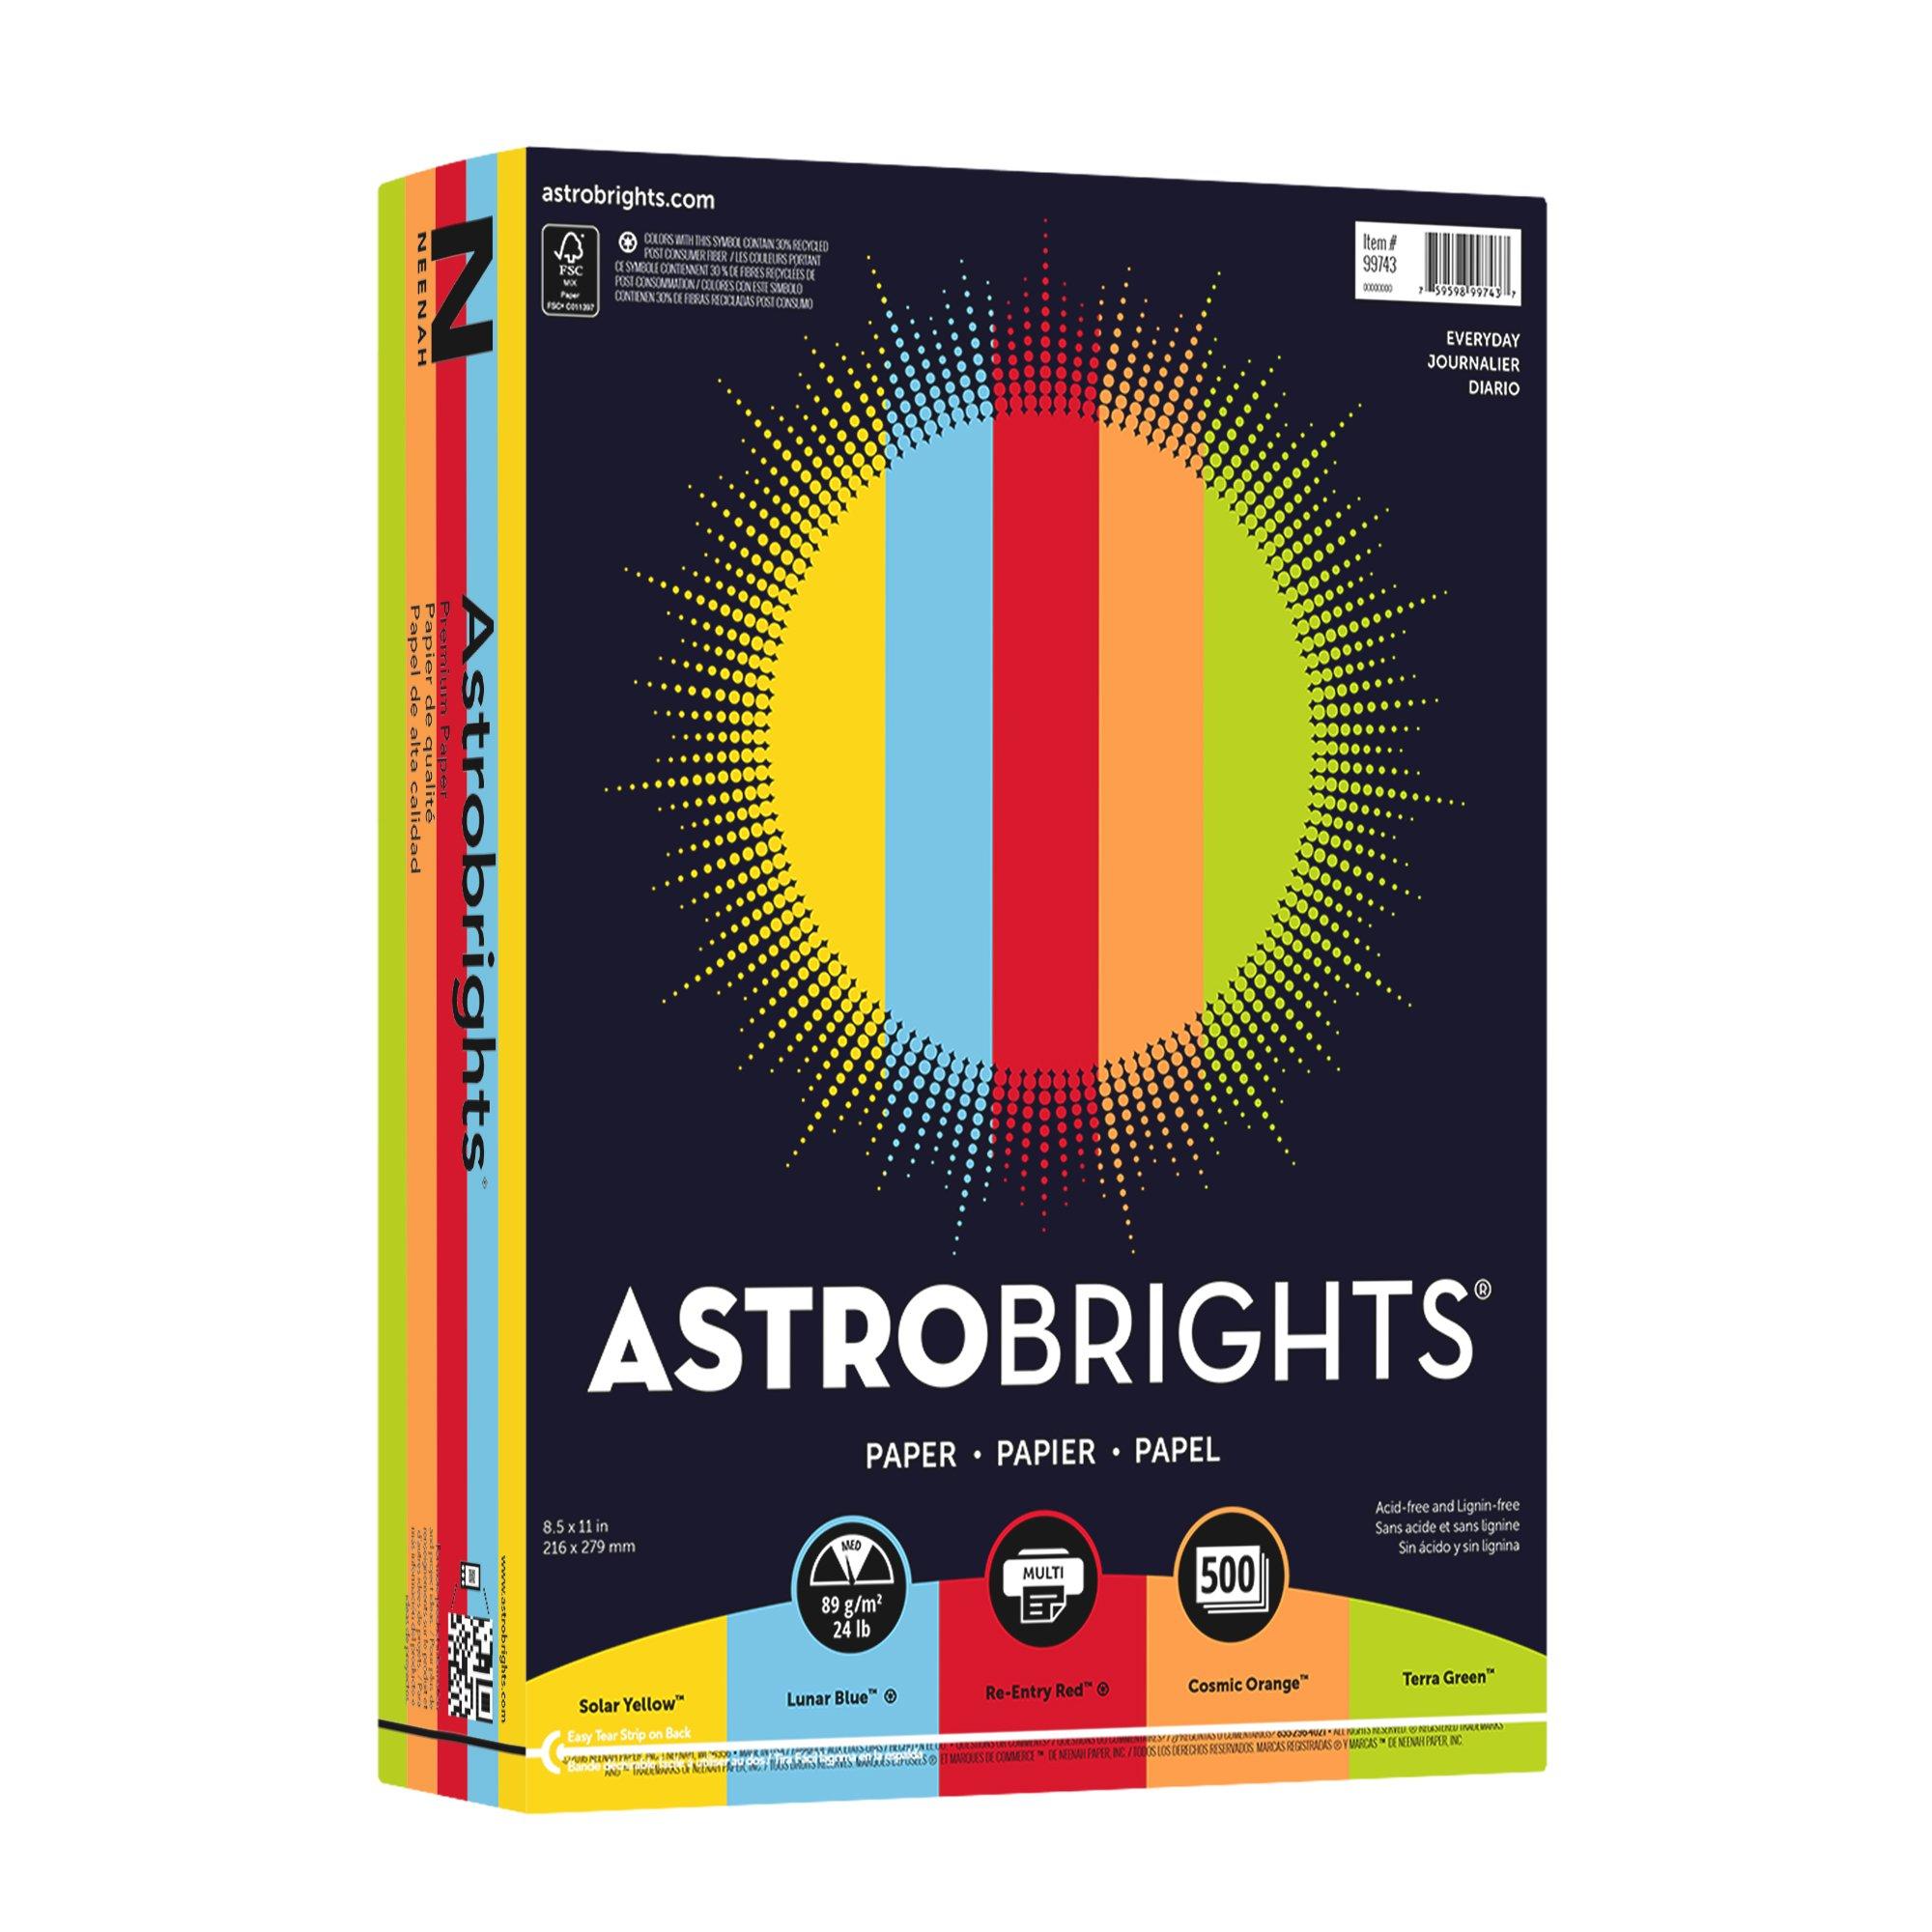 Astrobrights Color Paper, 8.5''x11'', 24lb/89 gsm, Everyday 5-Color Assortment, 500 sheets (99743)